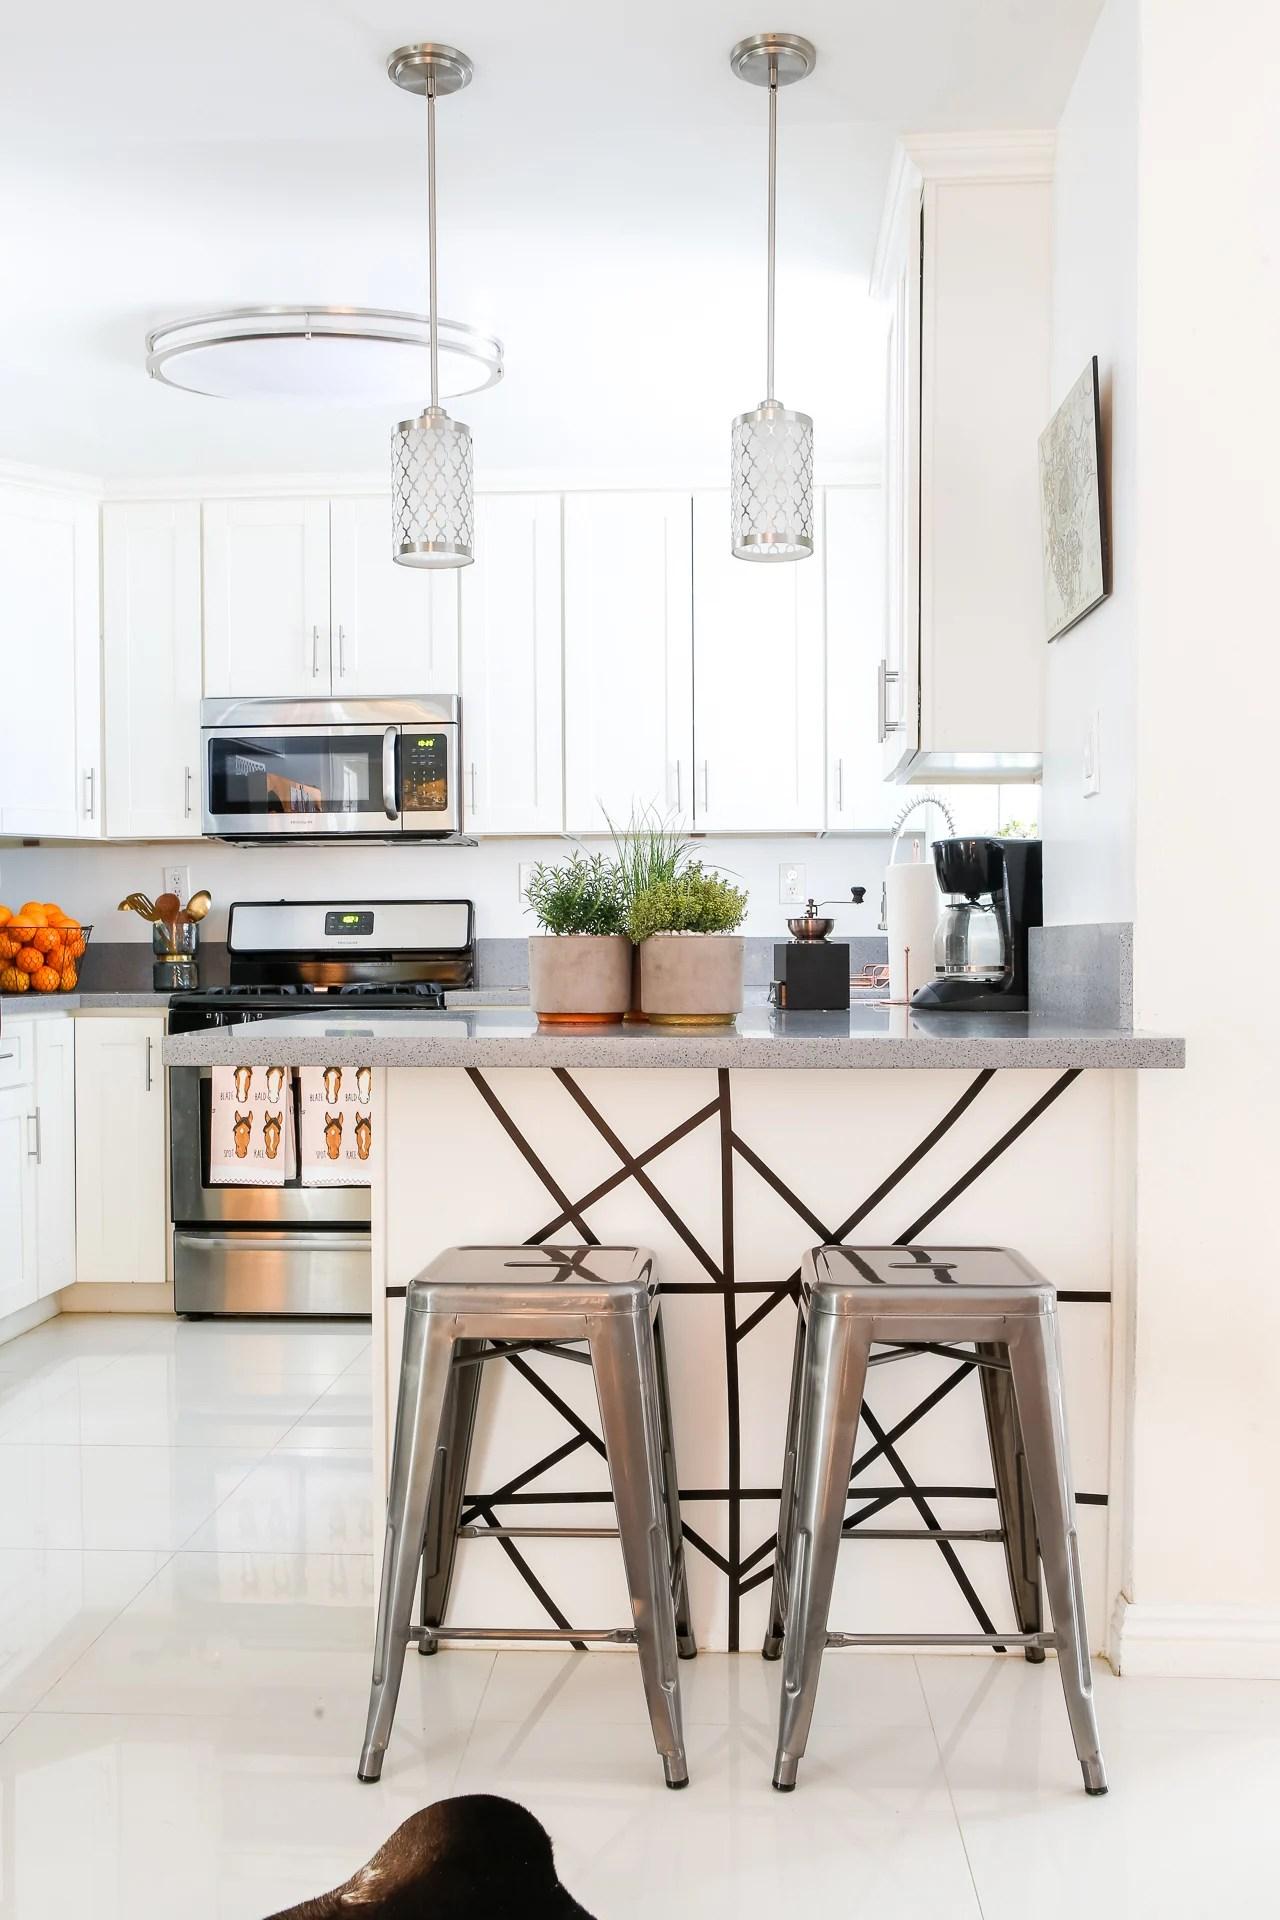 Best Small Kitchen Design Ideas - Smart Small Kitchen ... on Best Small Kitchens  id=13626